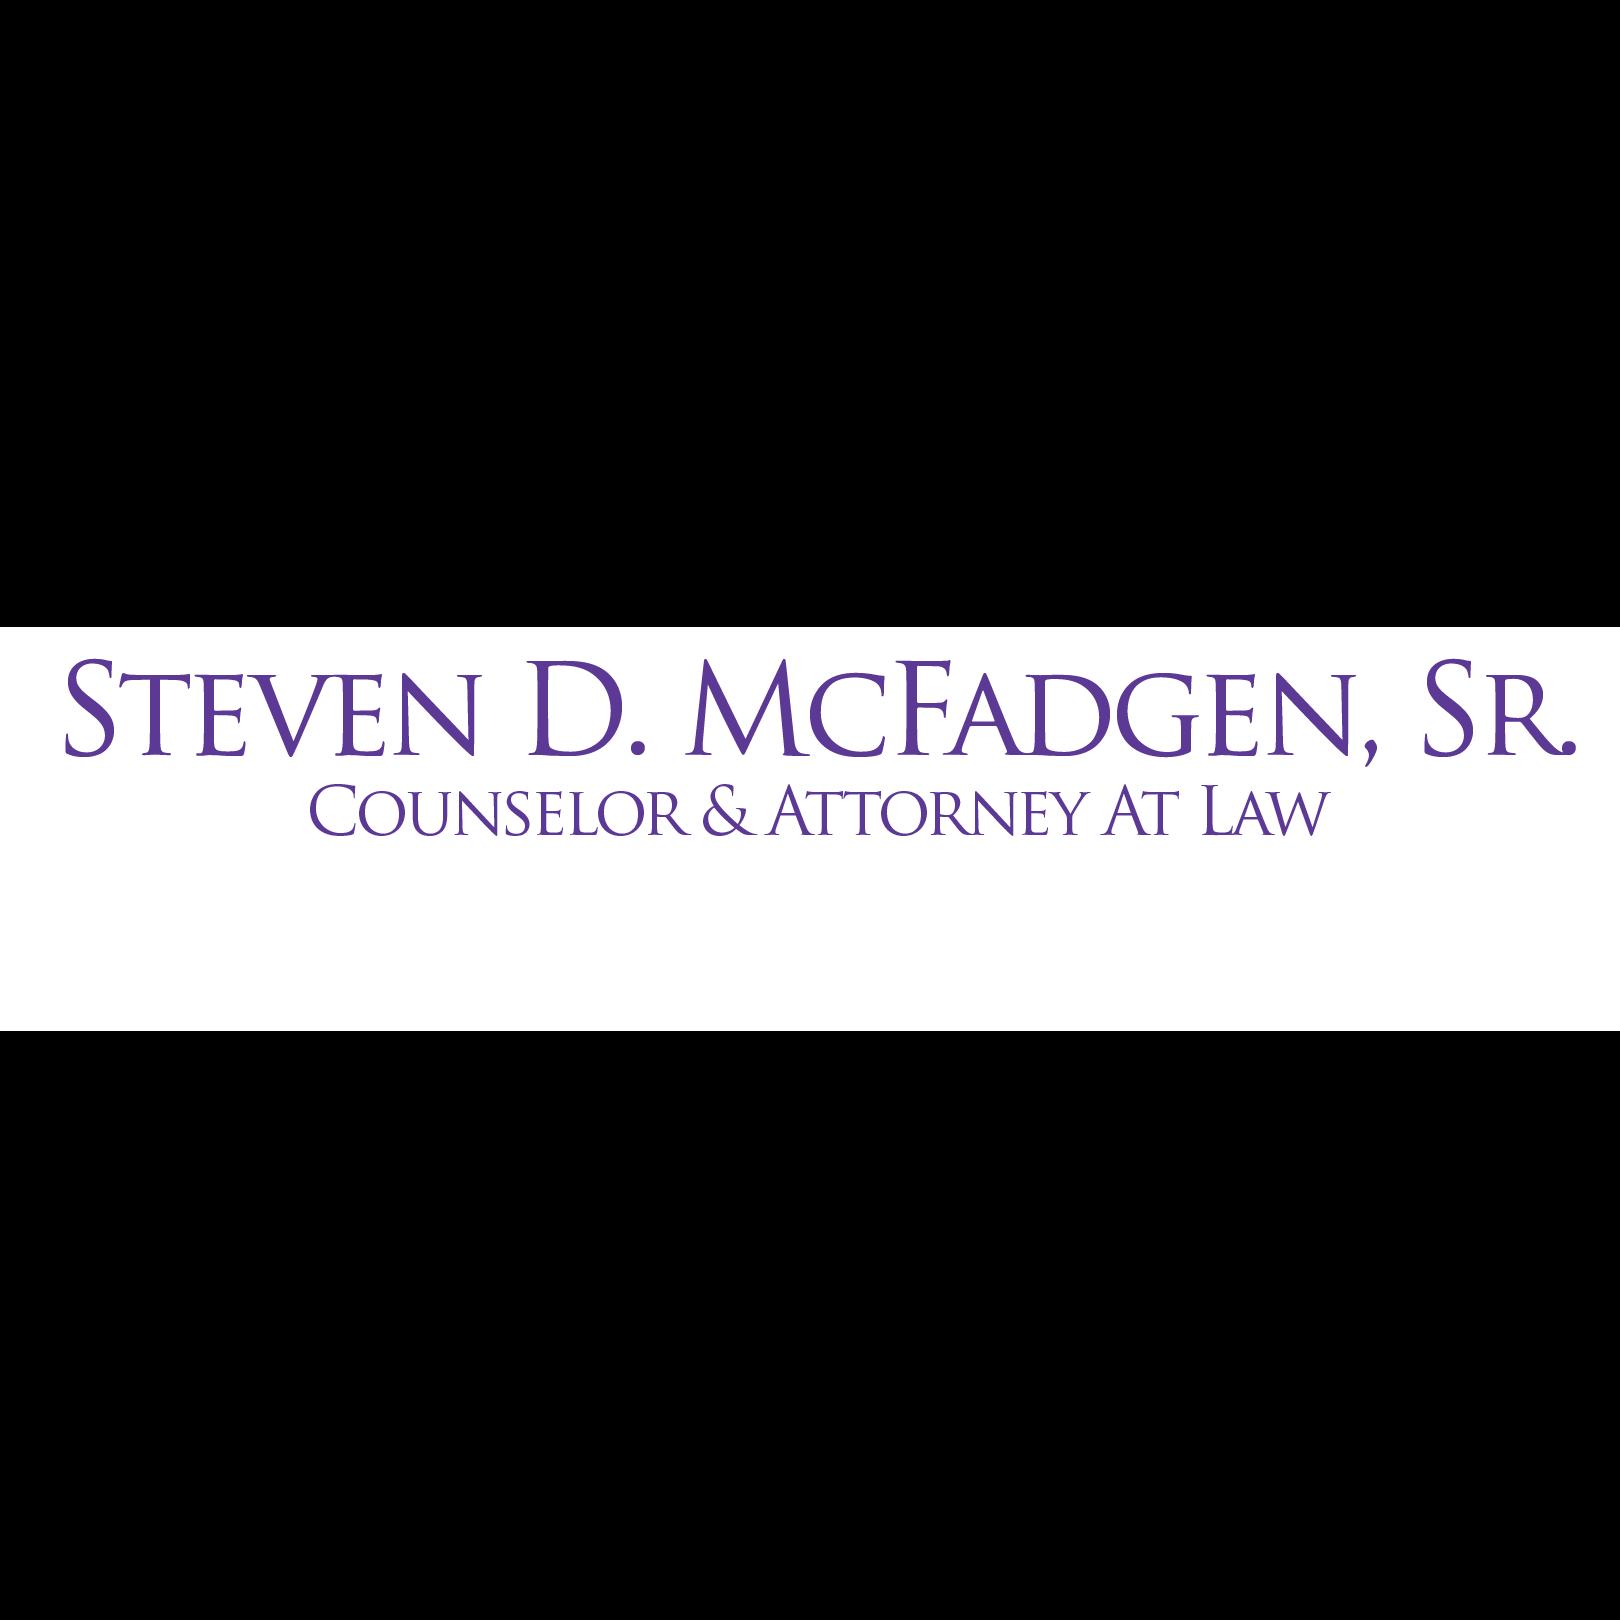 Steven D. McFadgen, Sr. Counselor & Attorney At Law - Lynchburg, VA 24501 - (434)385-4579   ShowMeLocal.com